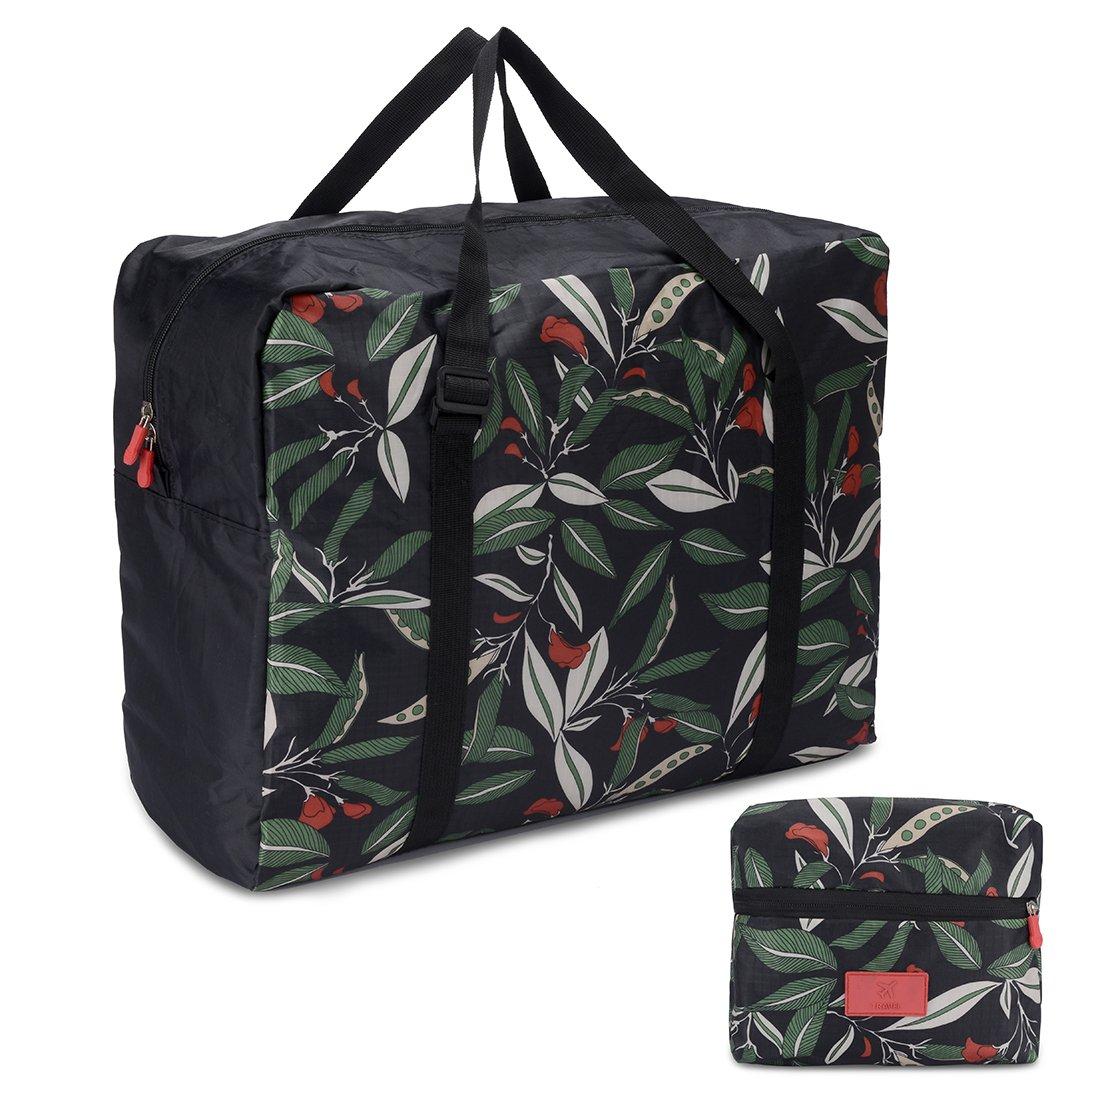 Foldable Travel Tote Bag Waterproof High Capacity Portable Storage Luggage Bag (Green Leaves)